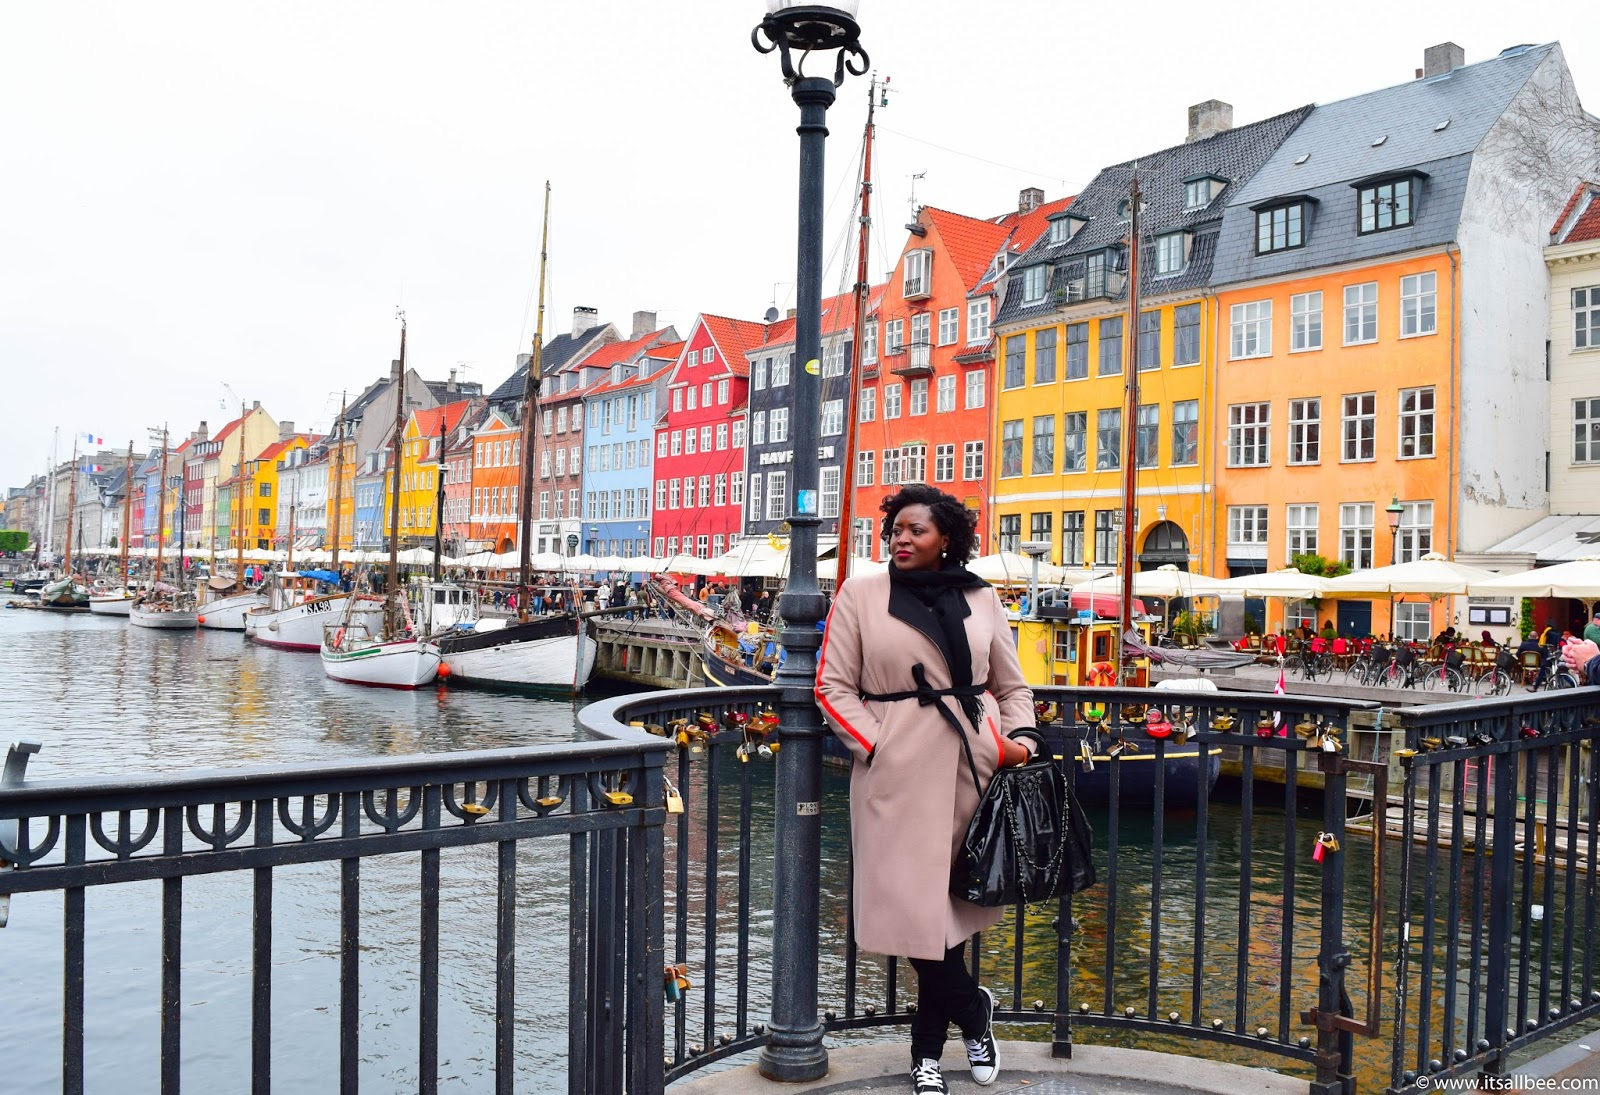 Copenhagen Travel Guide - Places To Visit & Things To Do In Copenhagen #citybreak #europe #winter #traveltips #itsallbee #blogger #adventures #waterside #nyhvan #denmark